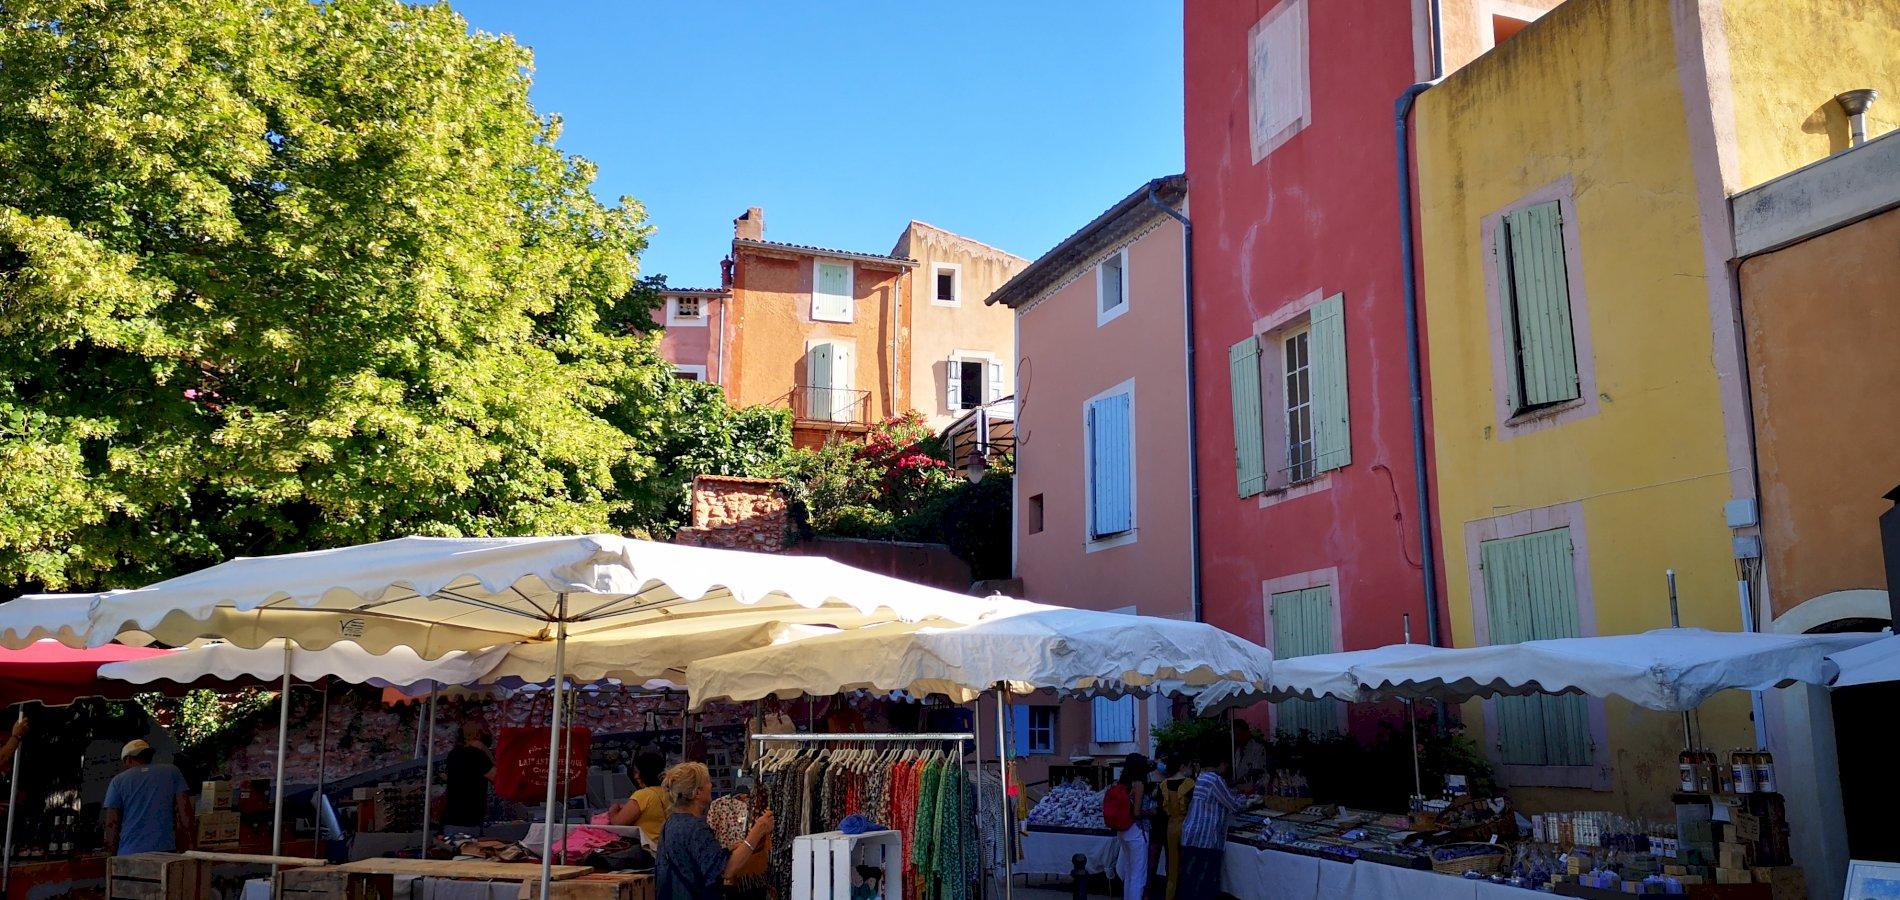 Ophorus Tours - Aix en Provence & the Luberon Private Shore excursion from Toulon